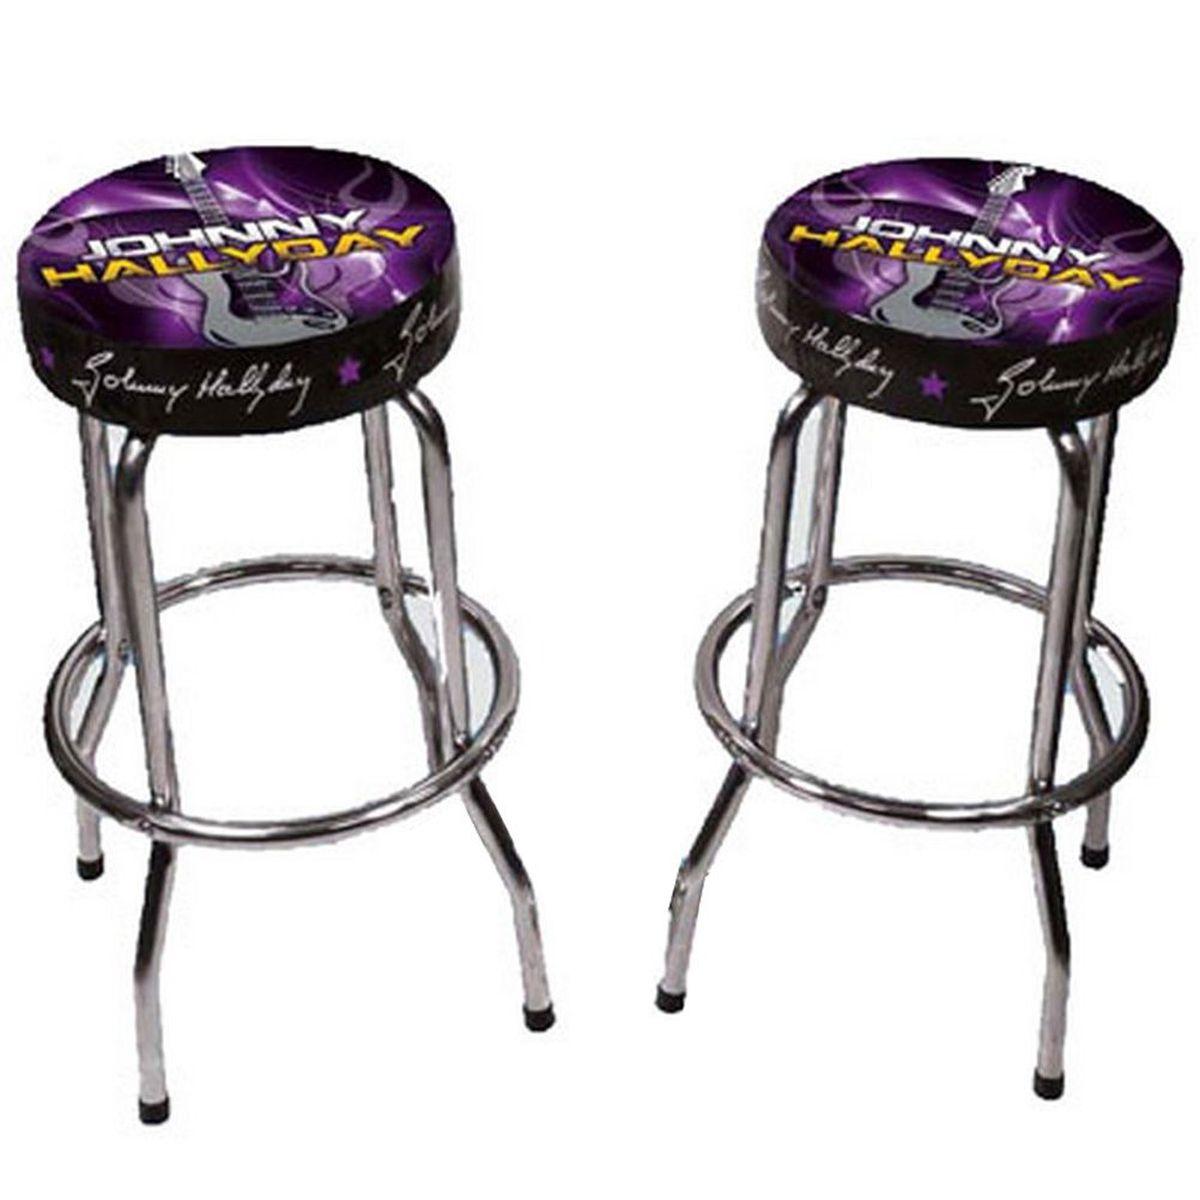 Set Of 2 Johnny Hallyday Purple Bar Stools